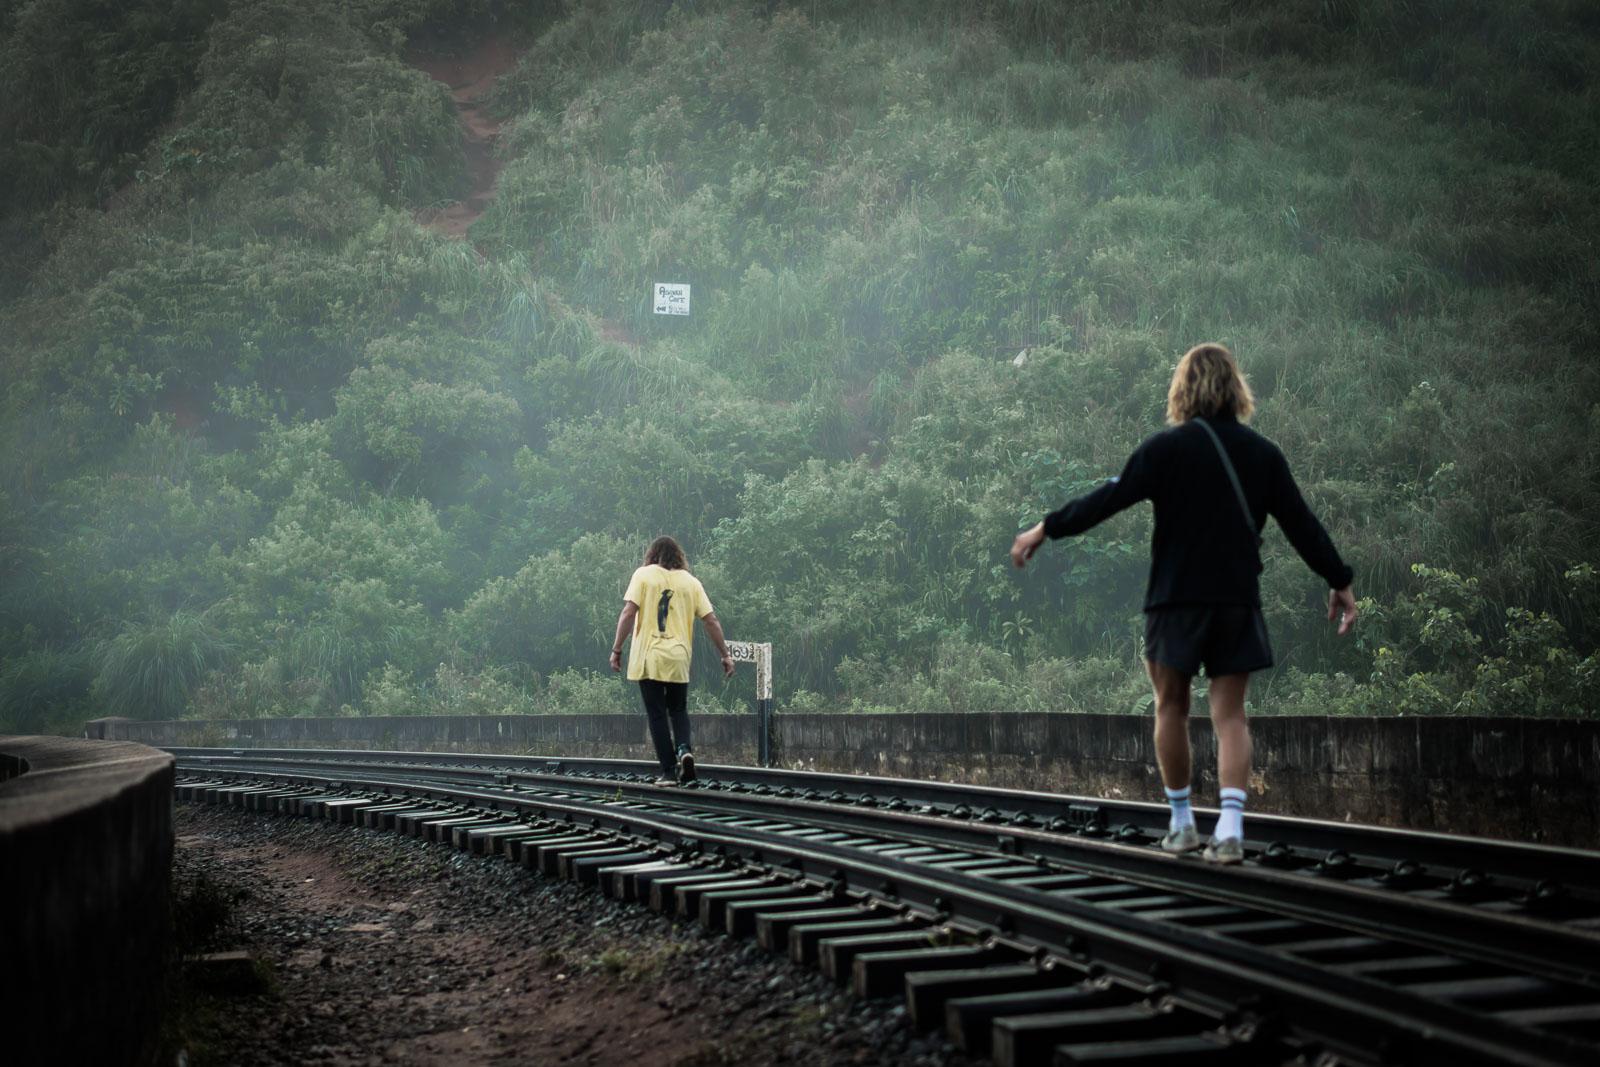 train-tracks-sri-lanka